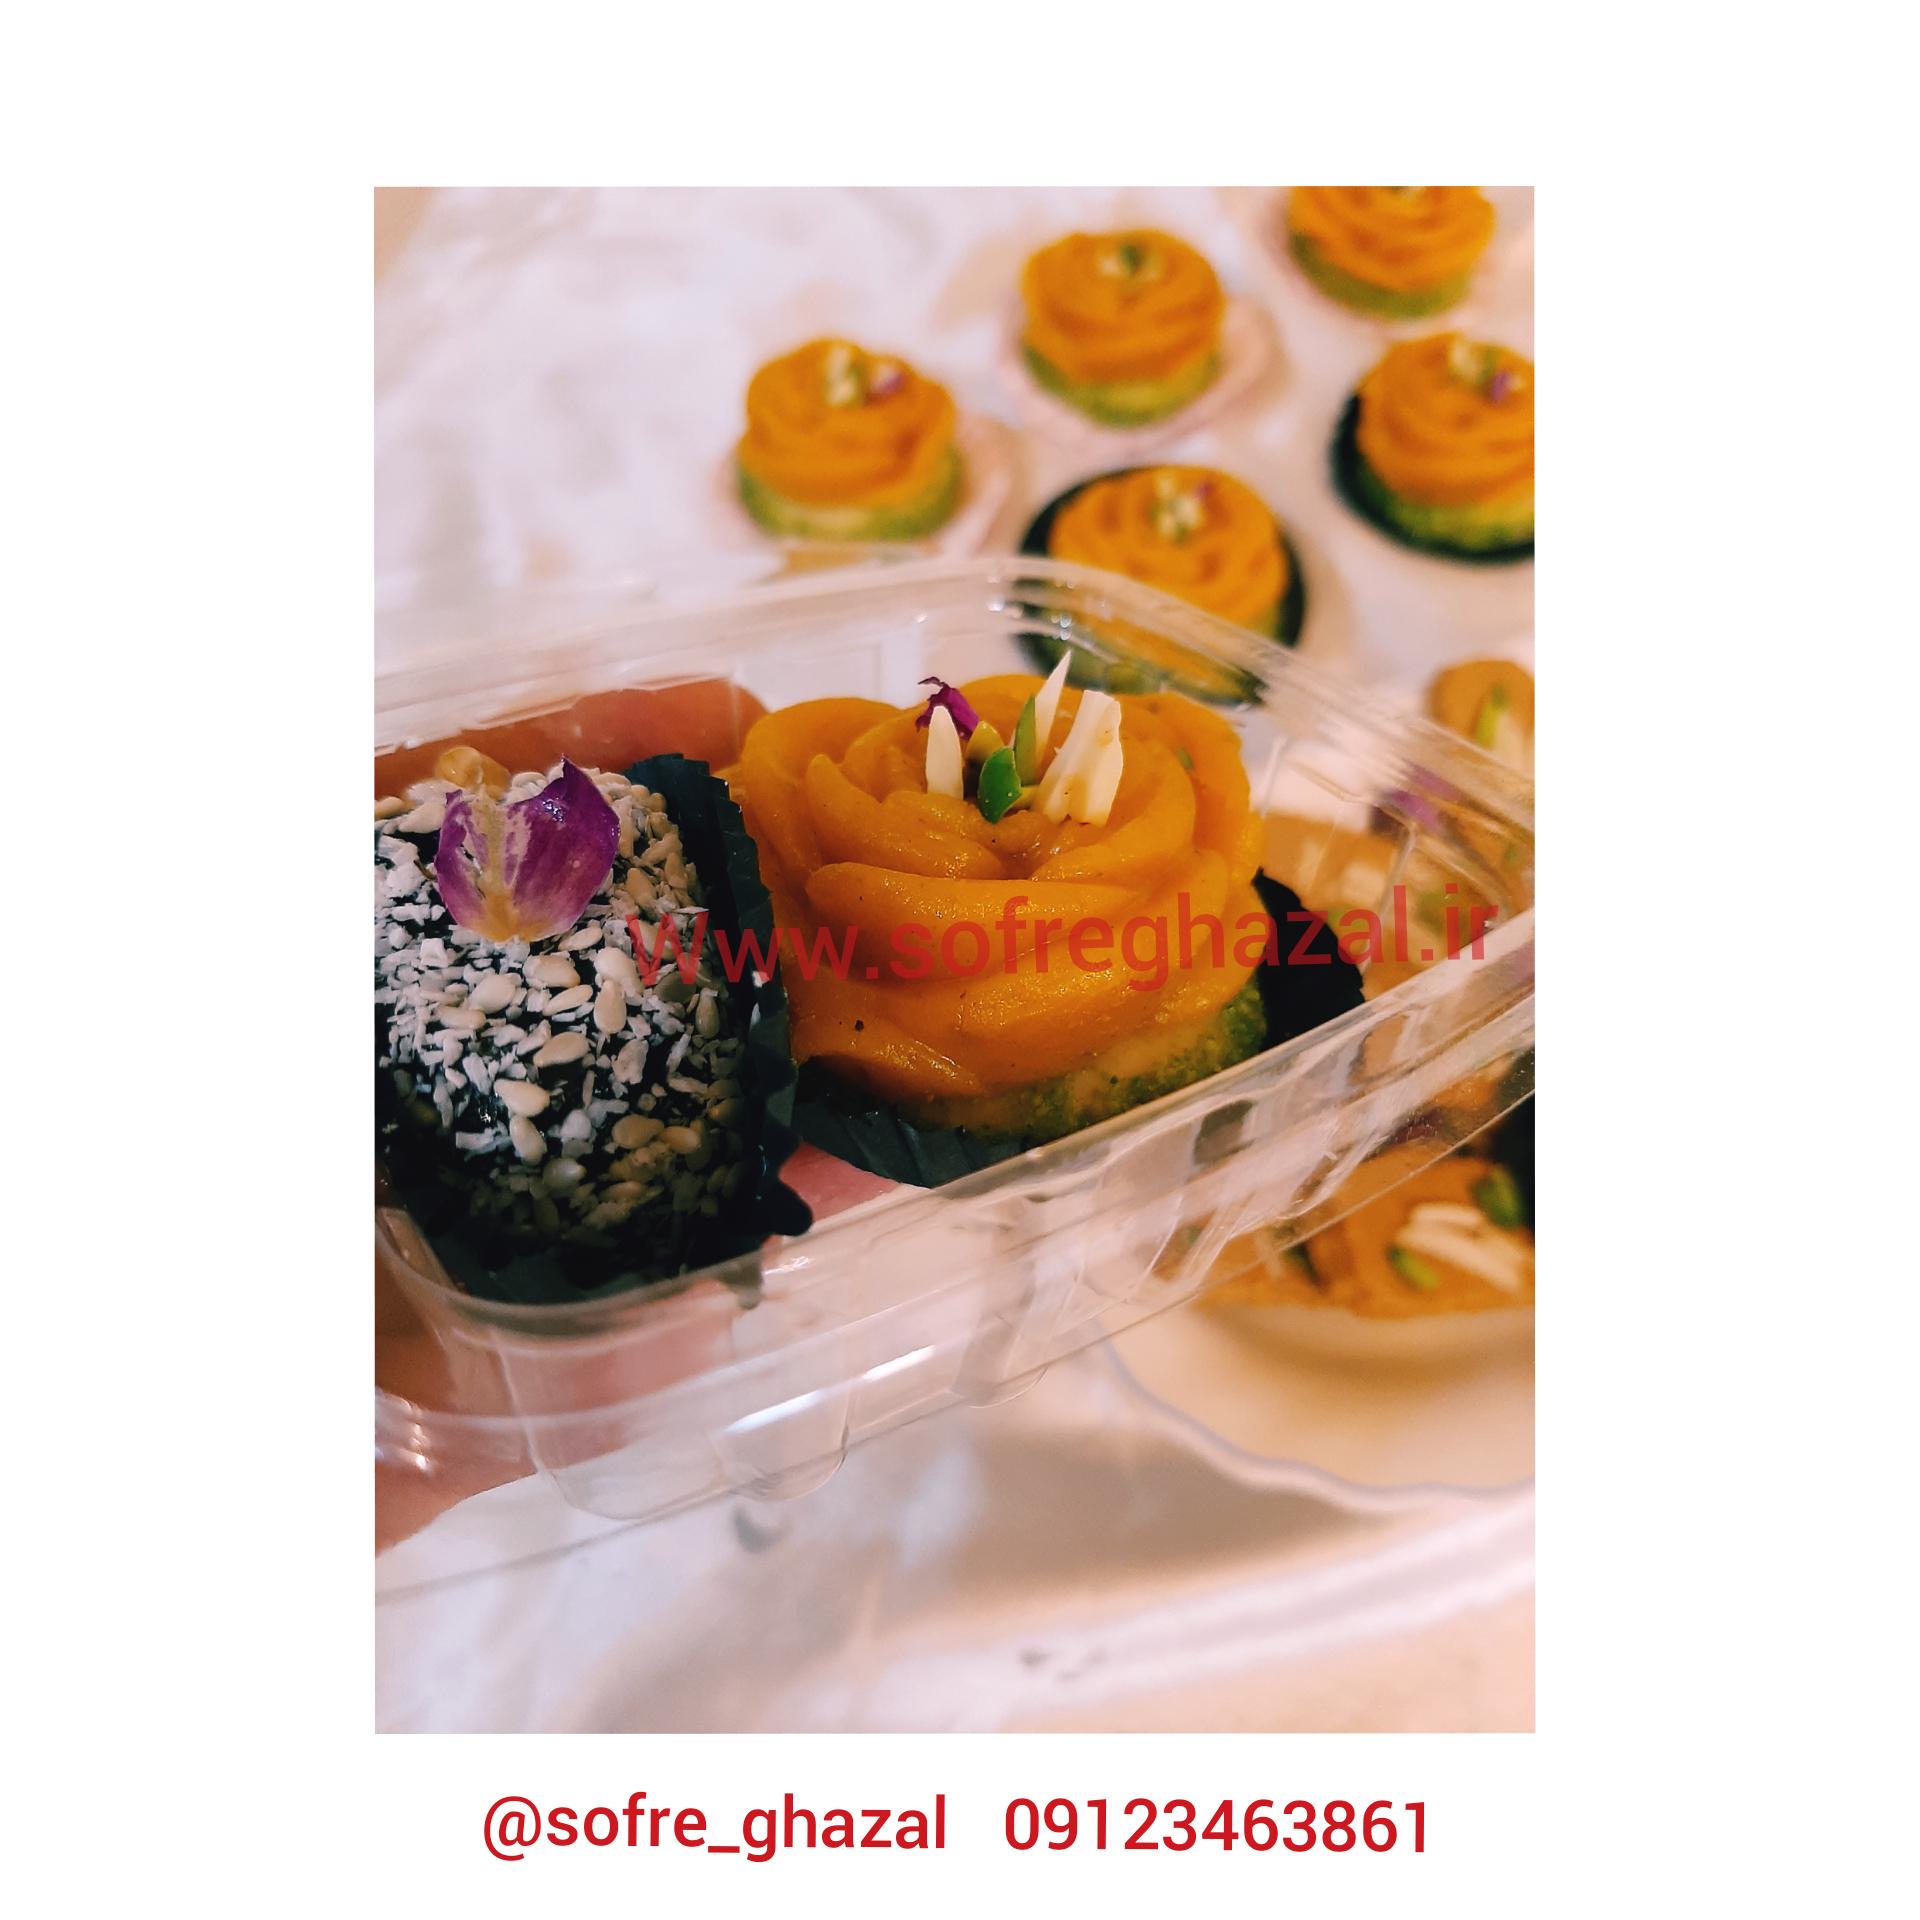 PhotoCollage_20201229_133647494